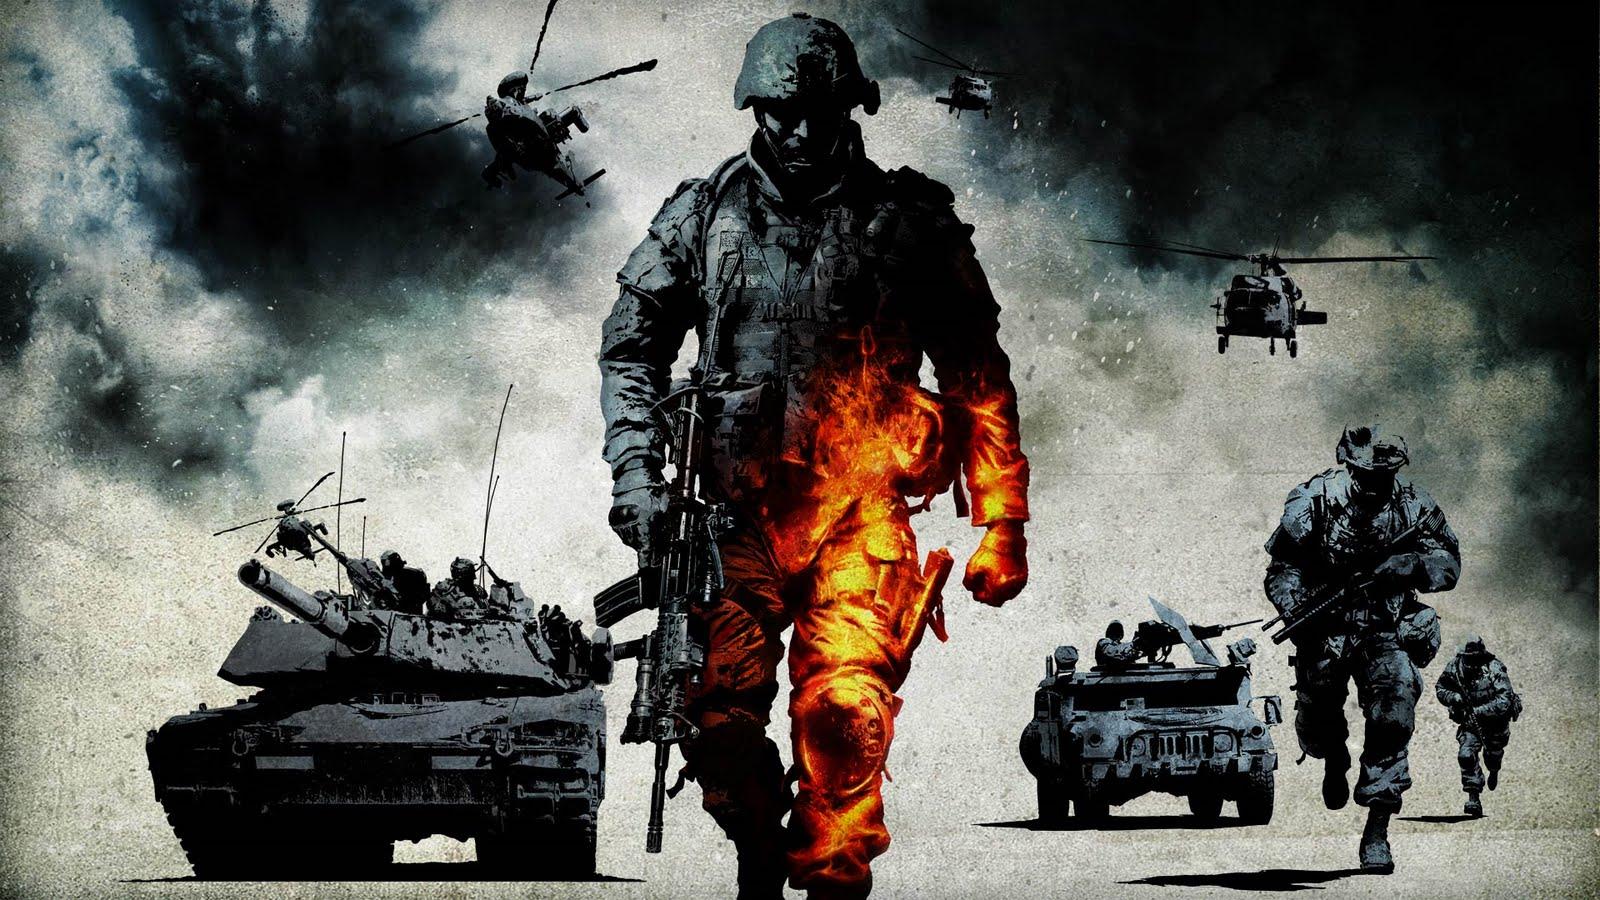 http://3.bp.blogspot.com/_2UbsSBz9ckE/S2C8vsAWUgI/AAAAAAAAAu4/jKQp0R6QMaU/s1600/Battlefield%20Bad%20Company%202%20HD%20wallpaper2.jpg